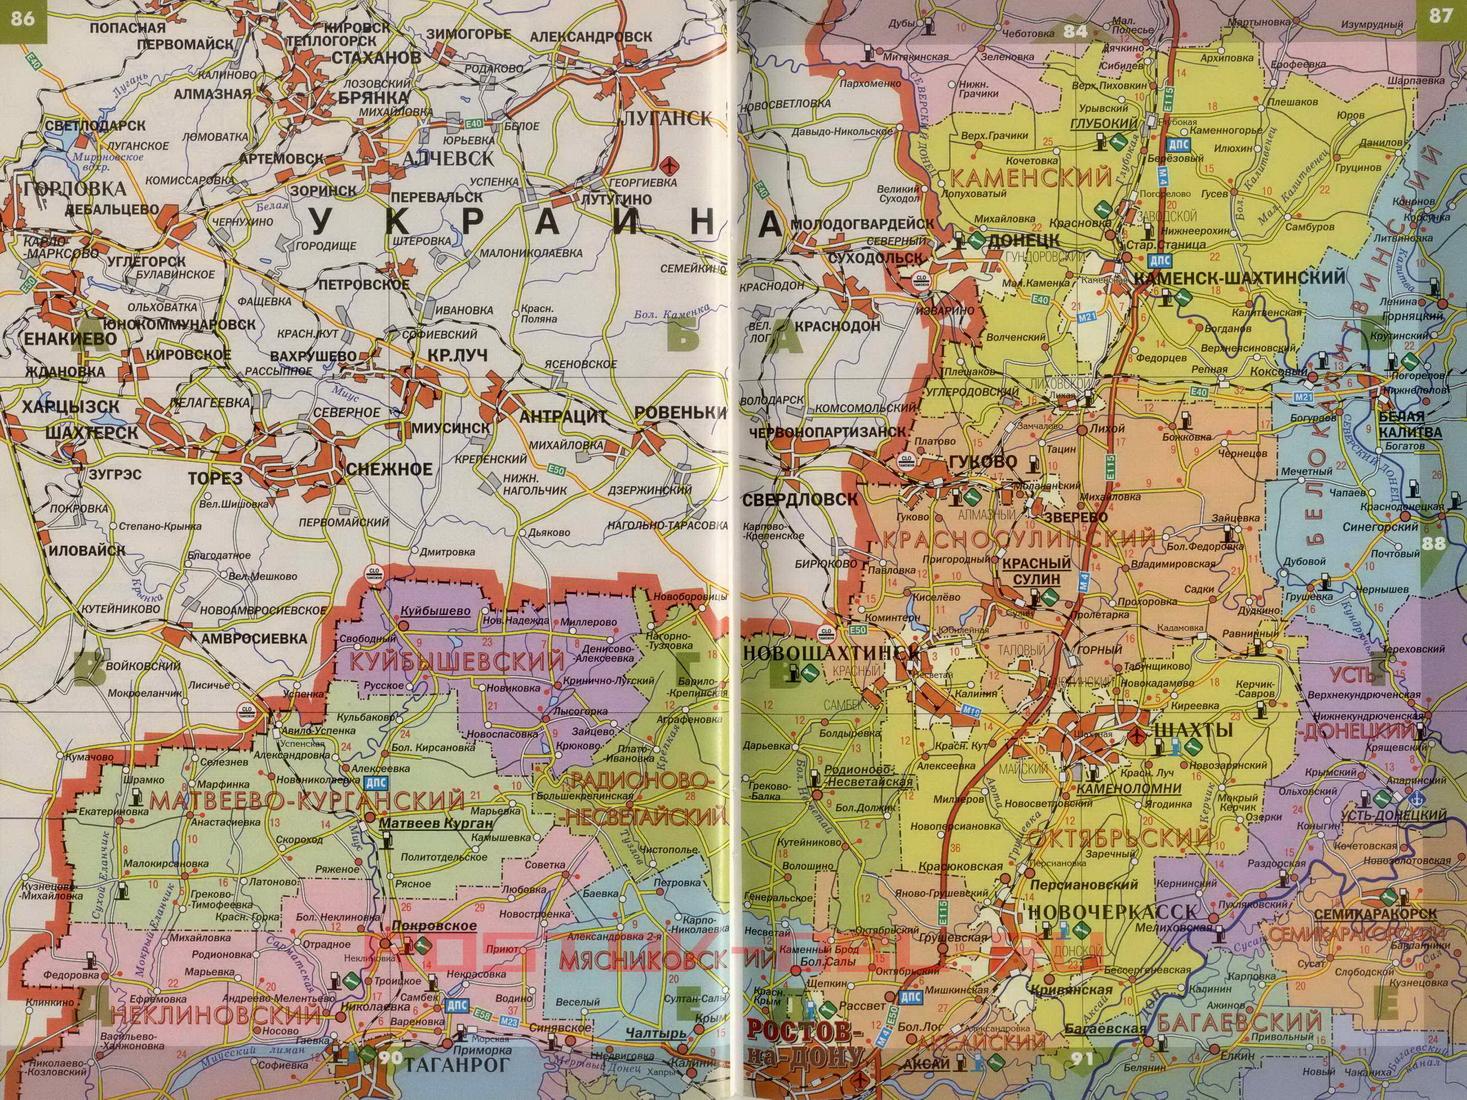 http://nakartemira.com/karta/img/rostovskoy-oblasti-dorogi.jpg